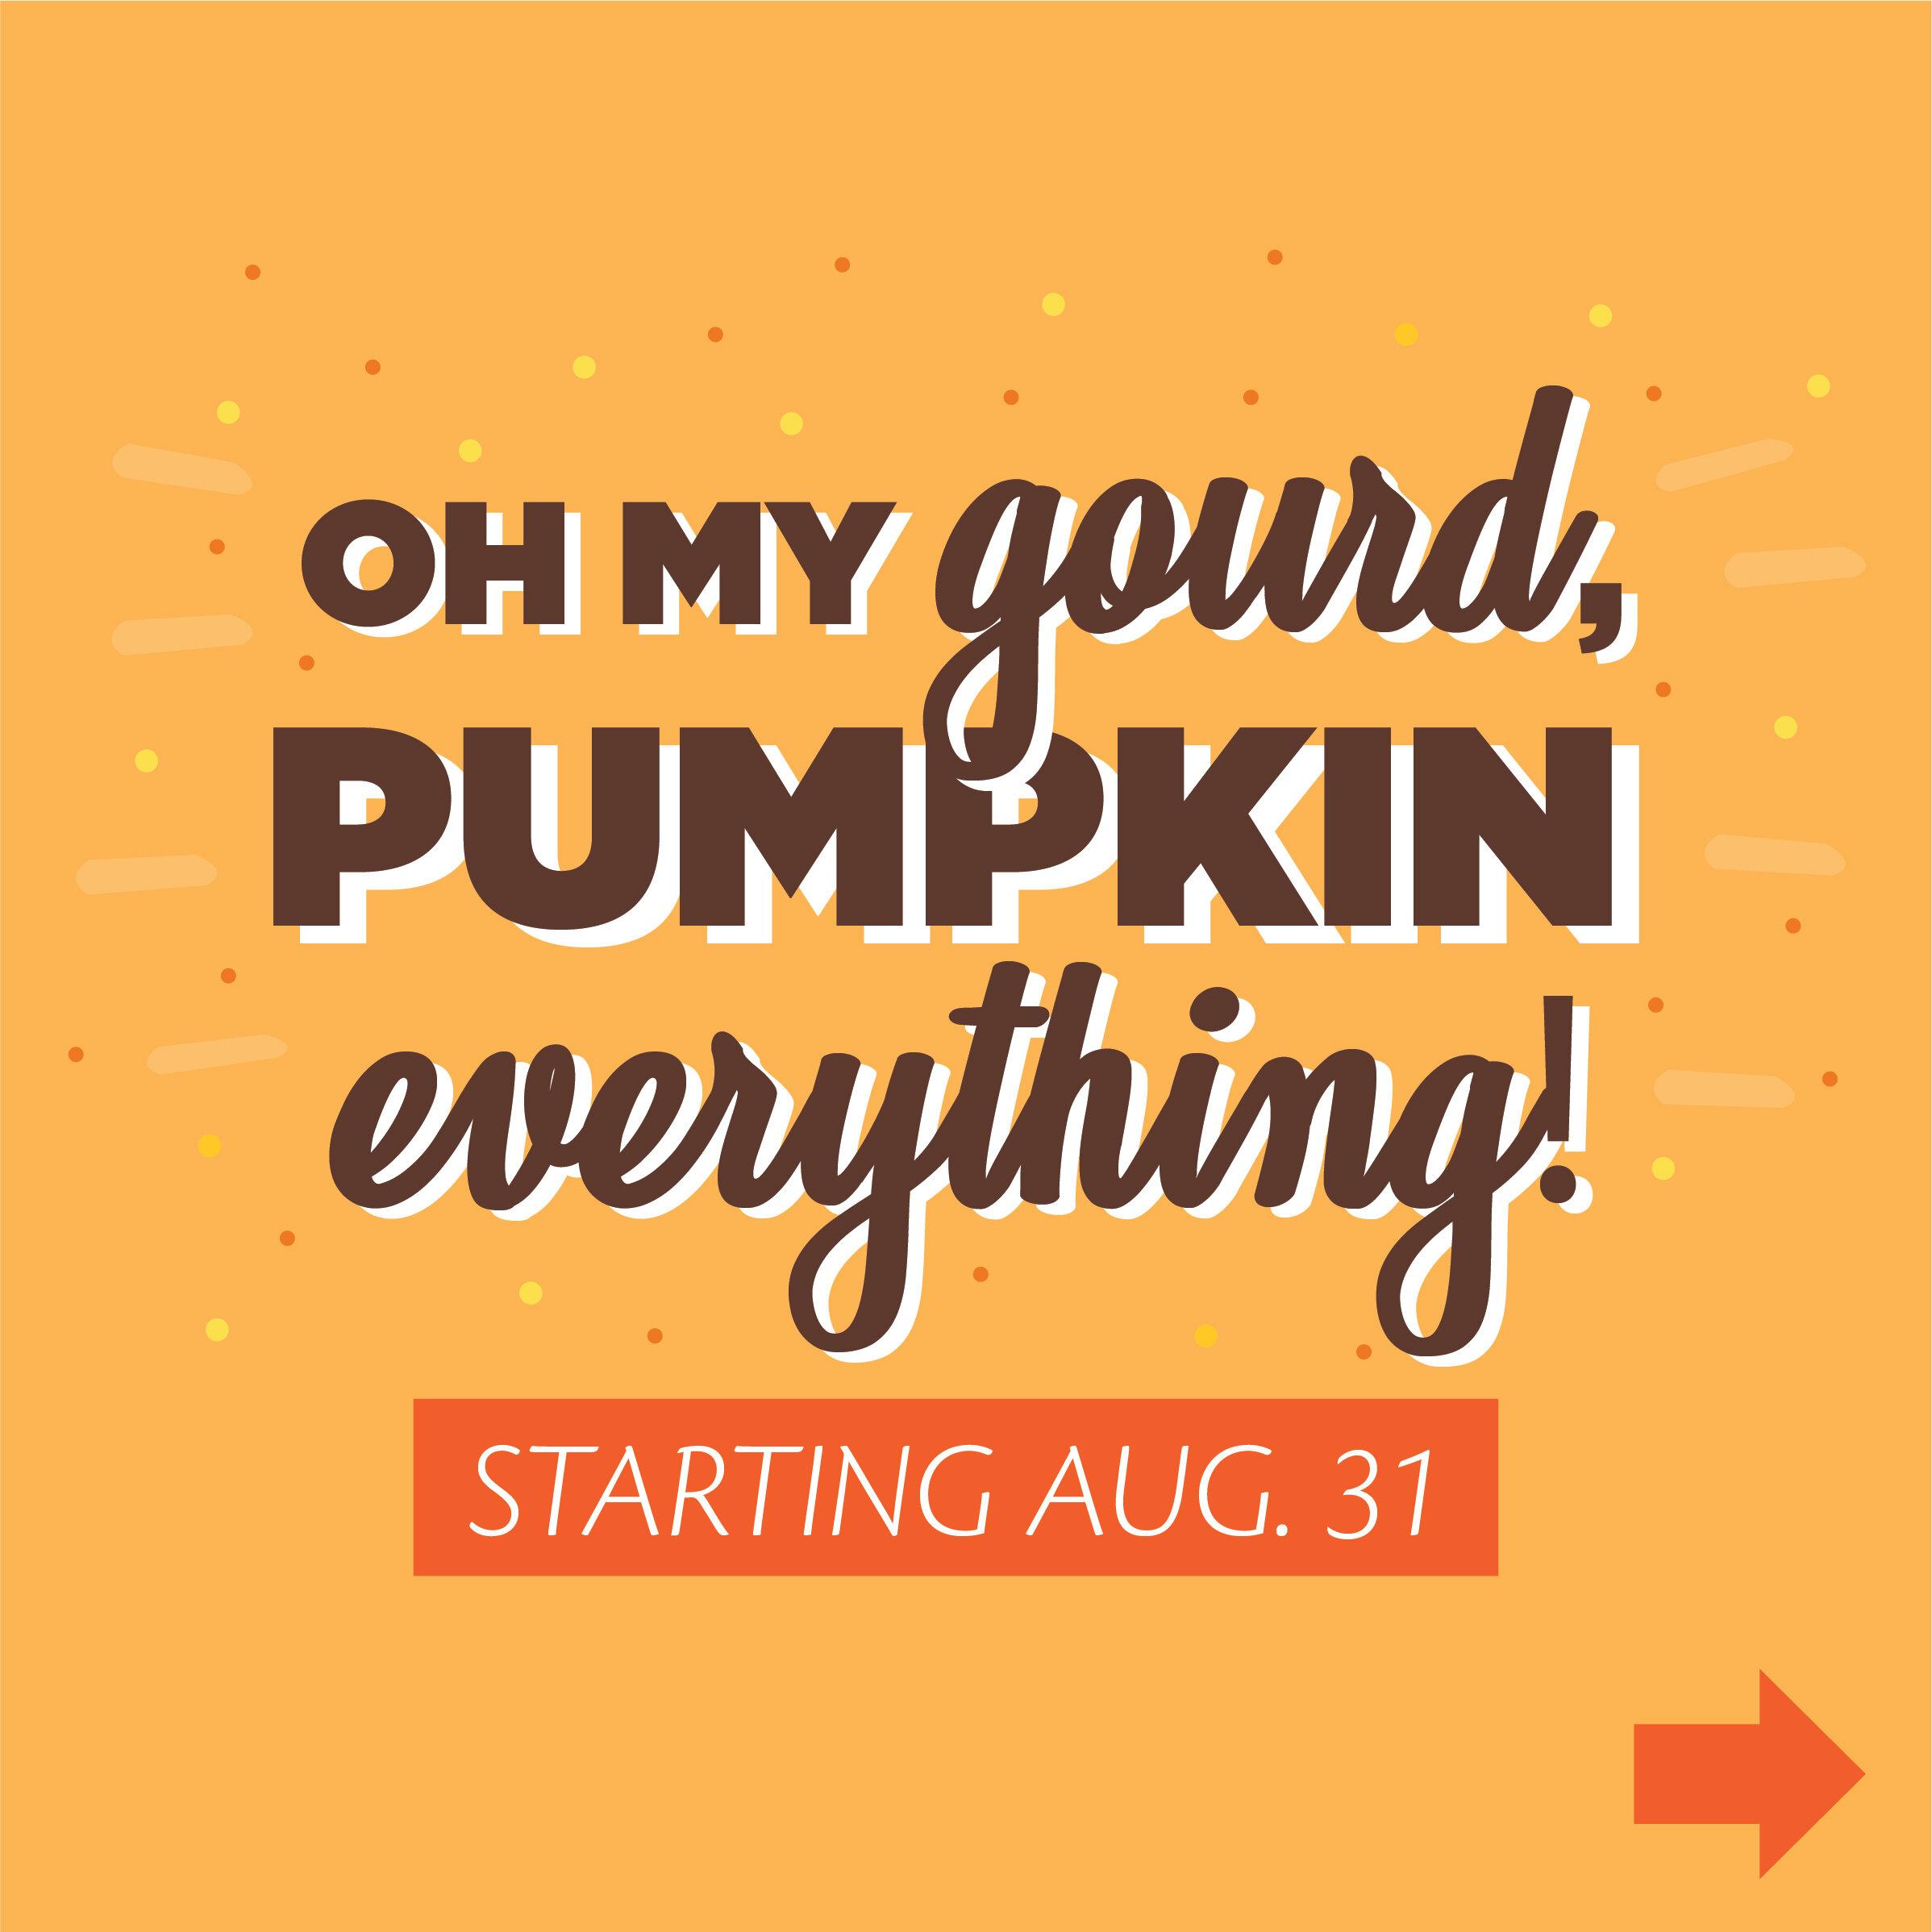 pumpkin everything-09-09.jpg